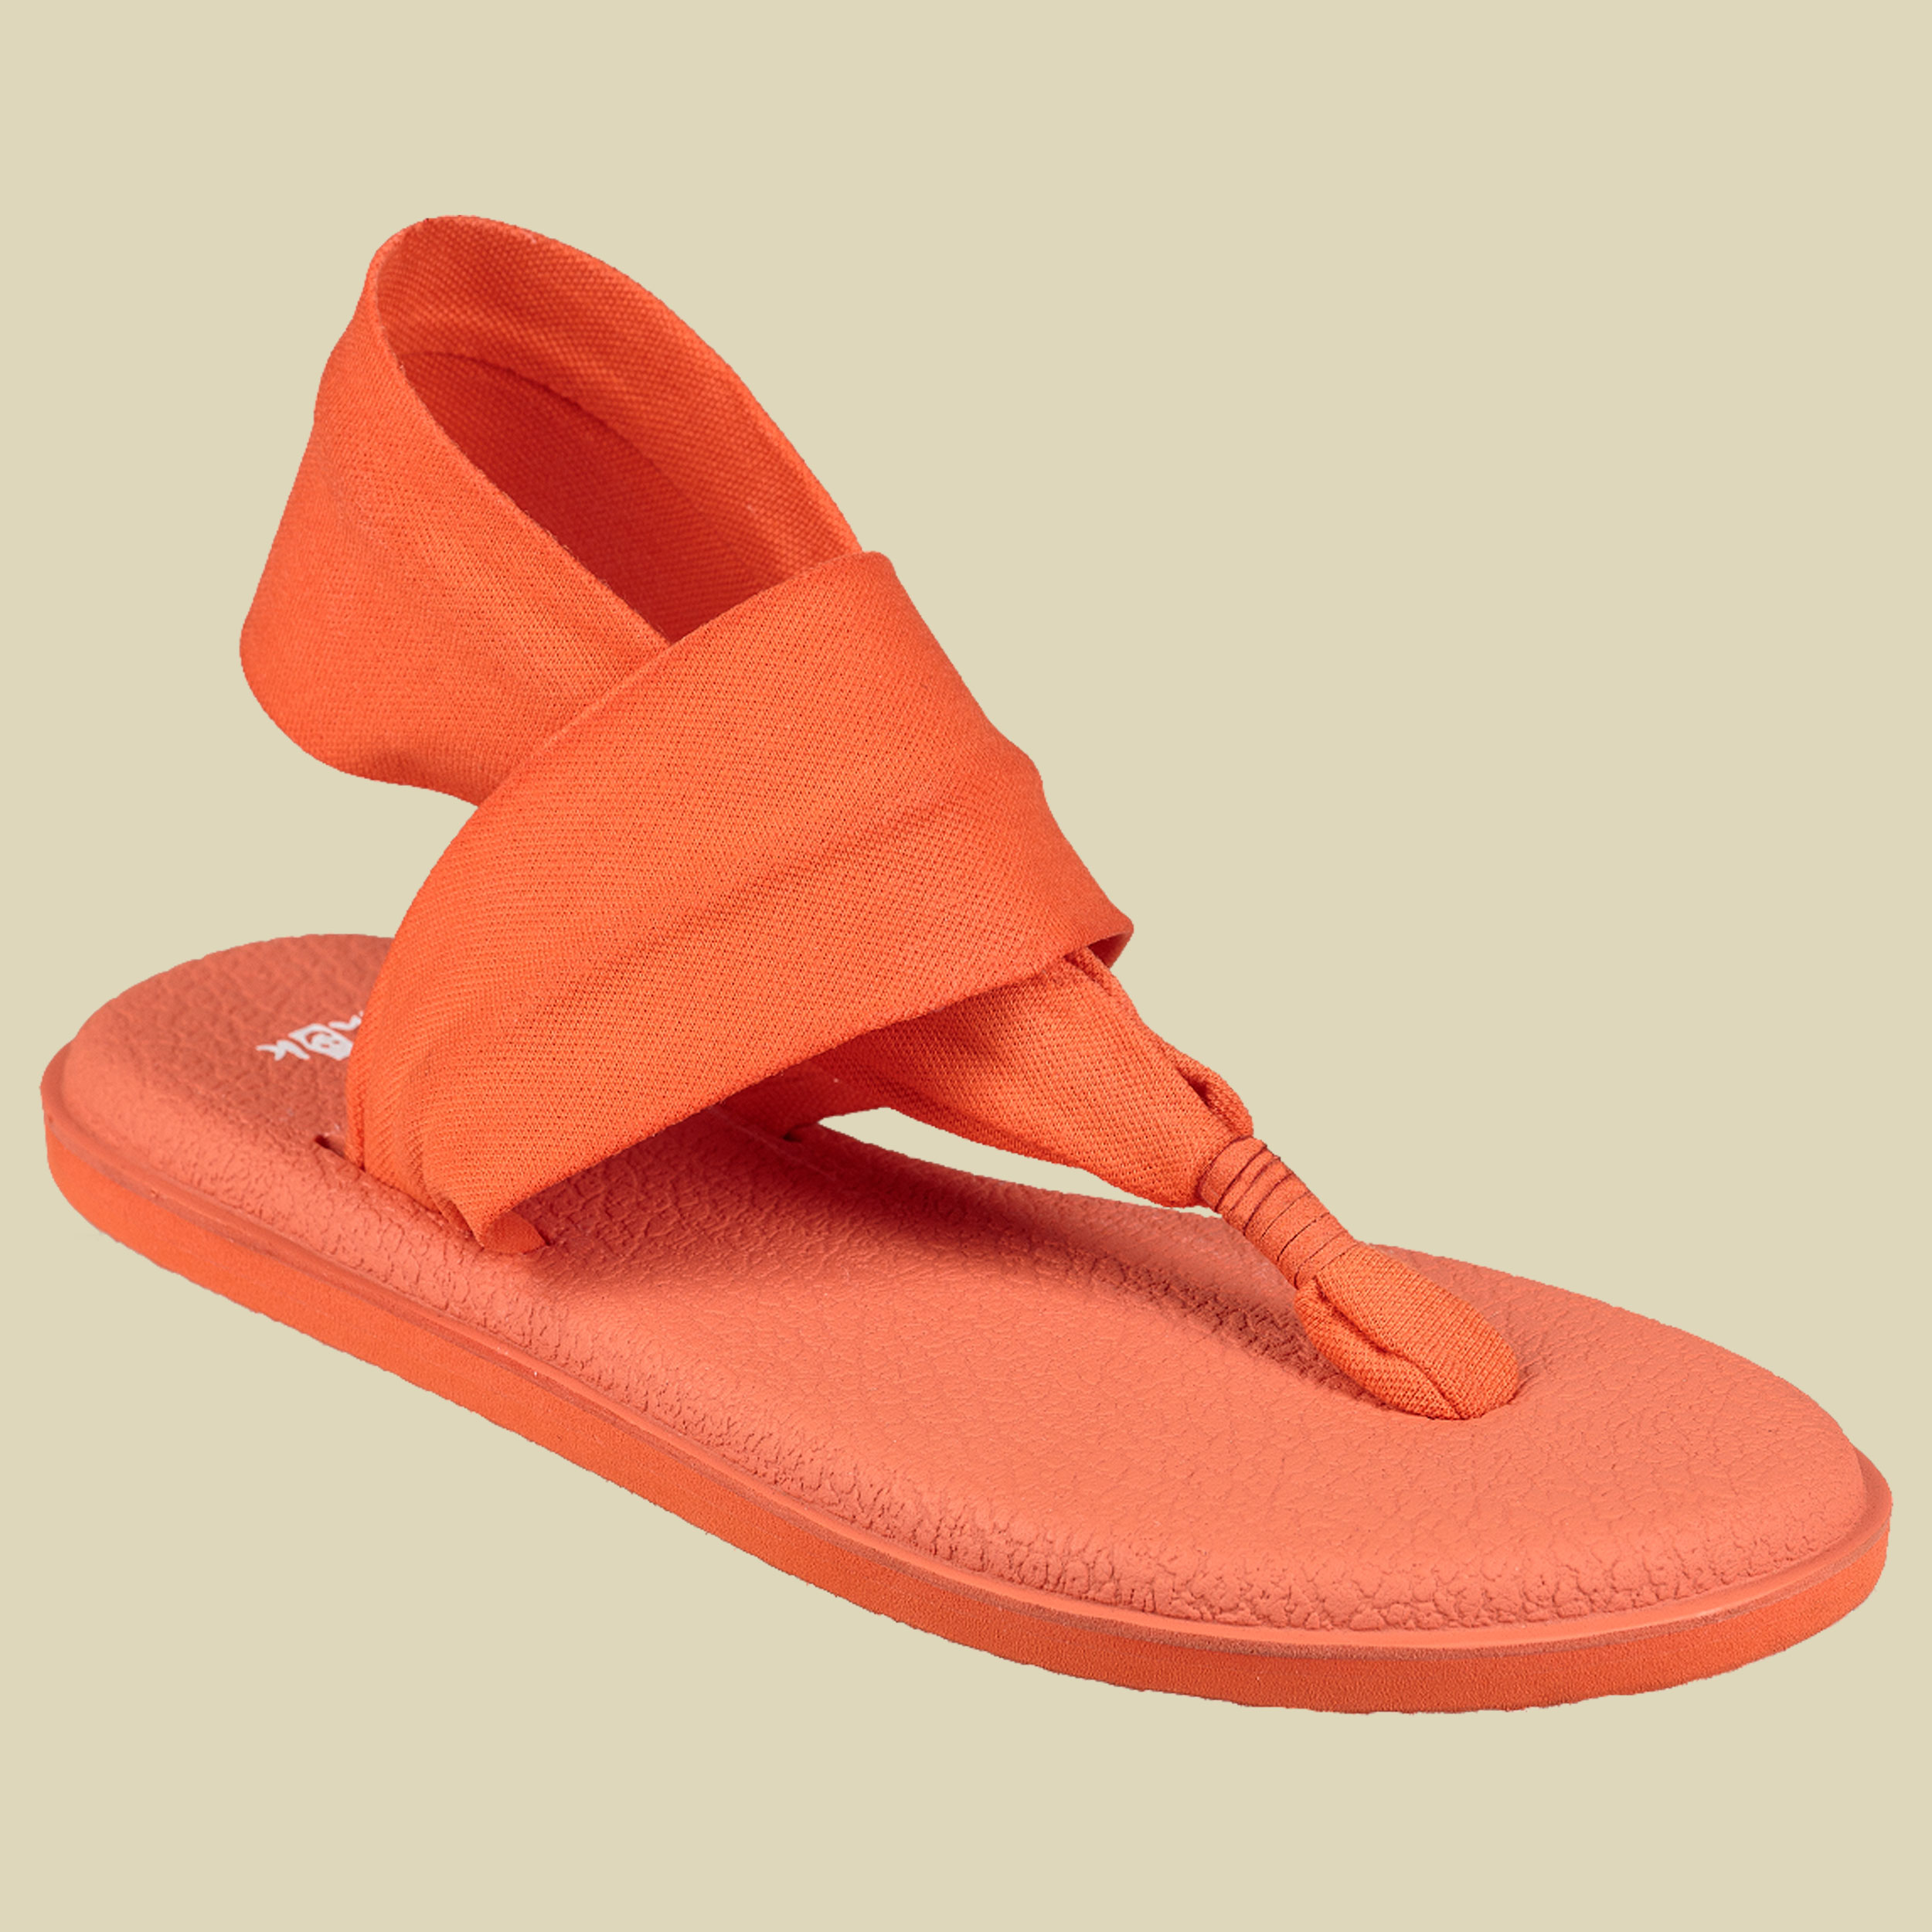 Sanuk Yoga Sling 2 Spectrum Women Damen Zehentrenner-Sandalen Größe UK 6 nasturtium